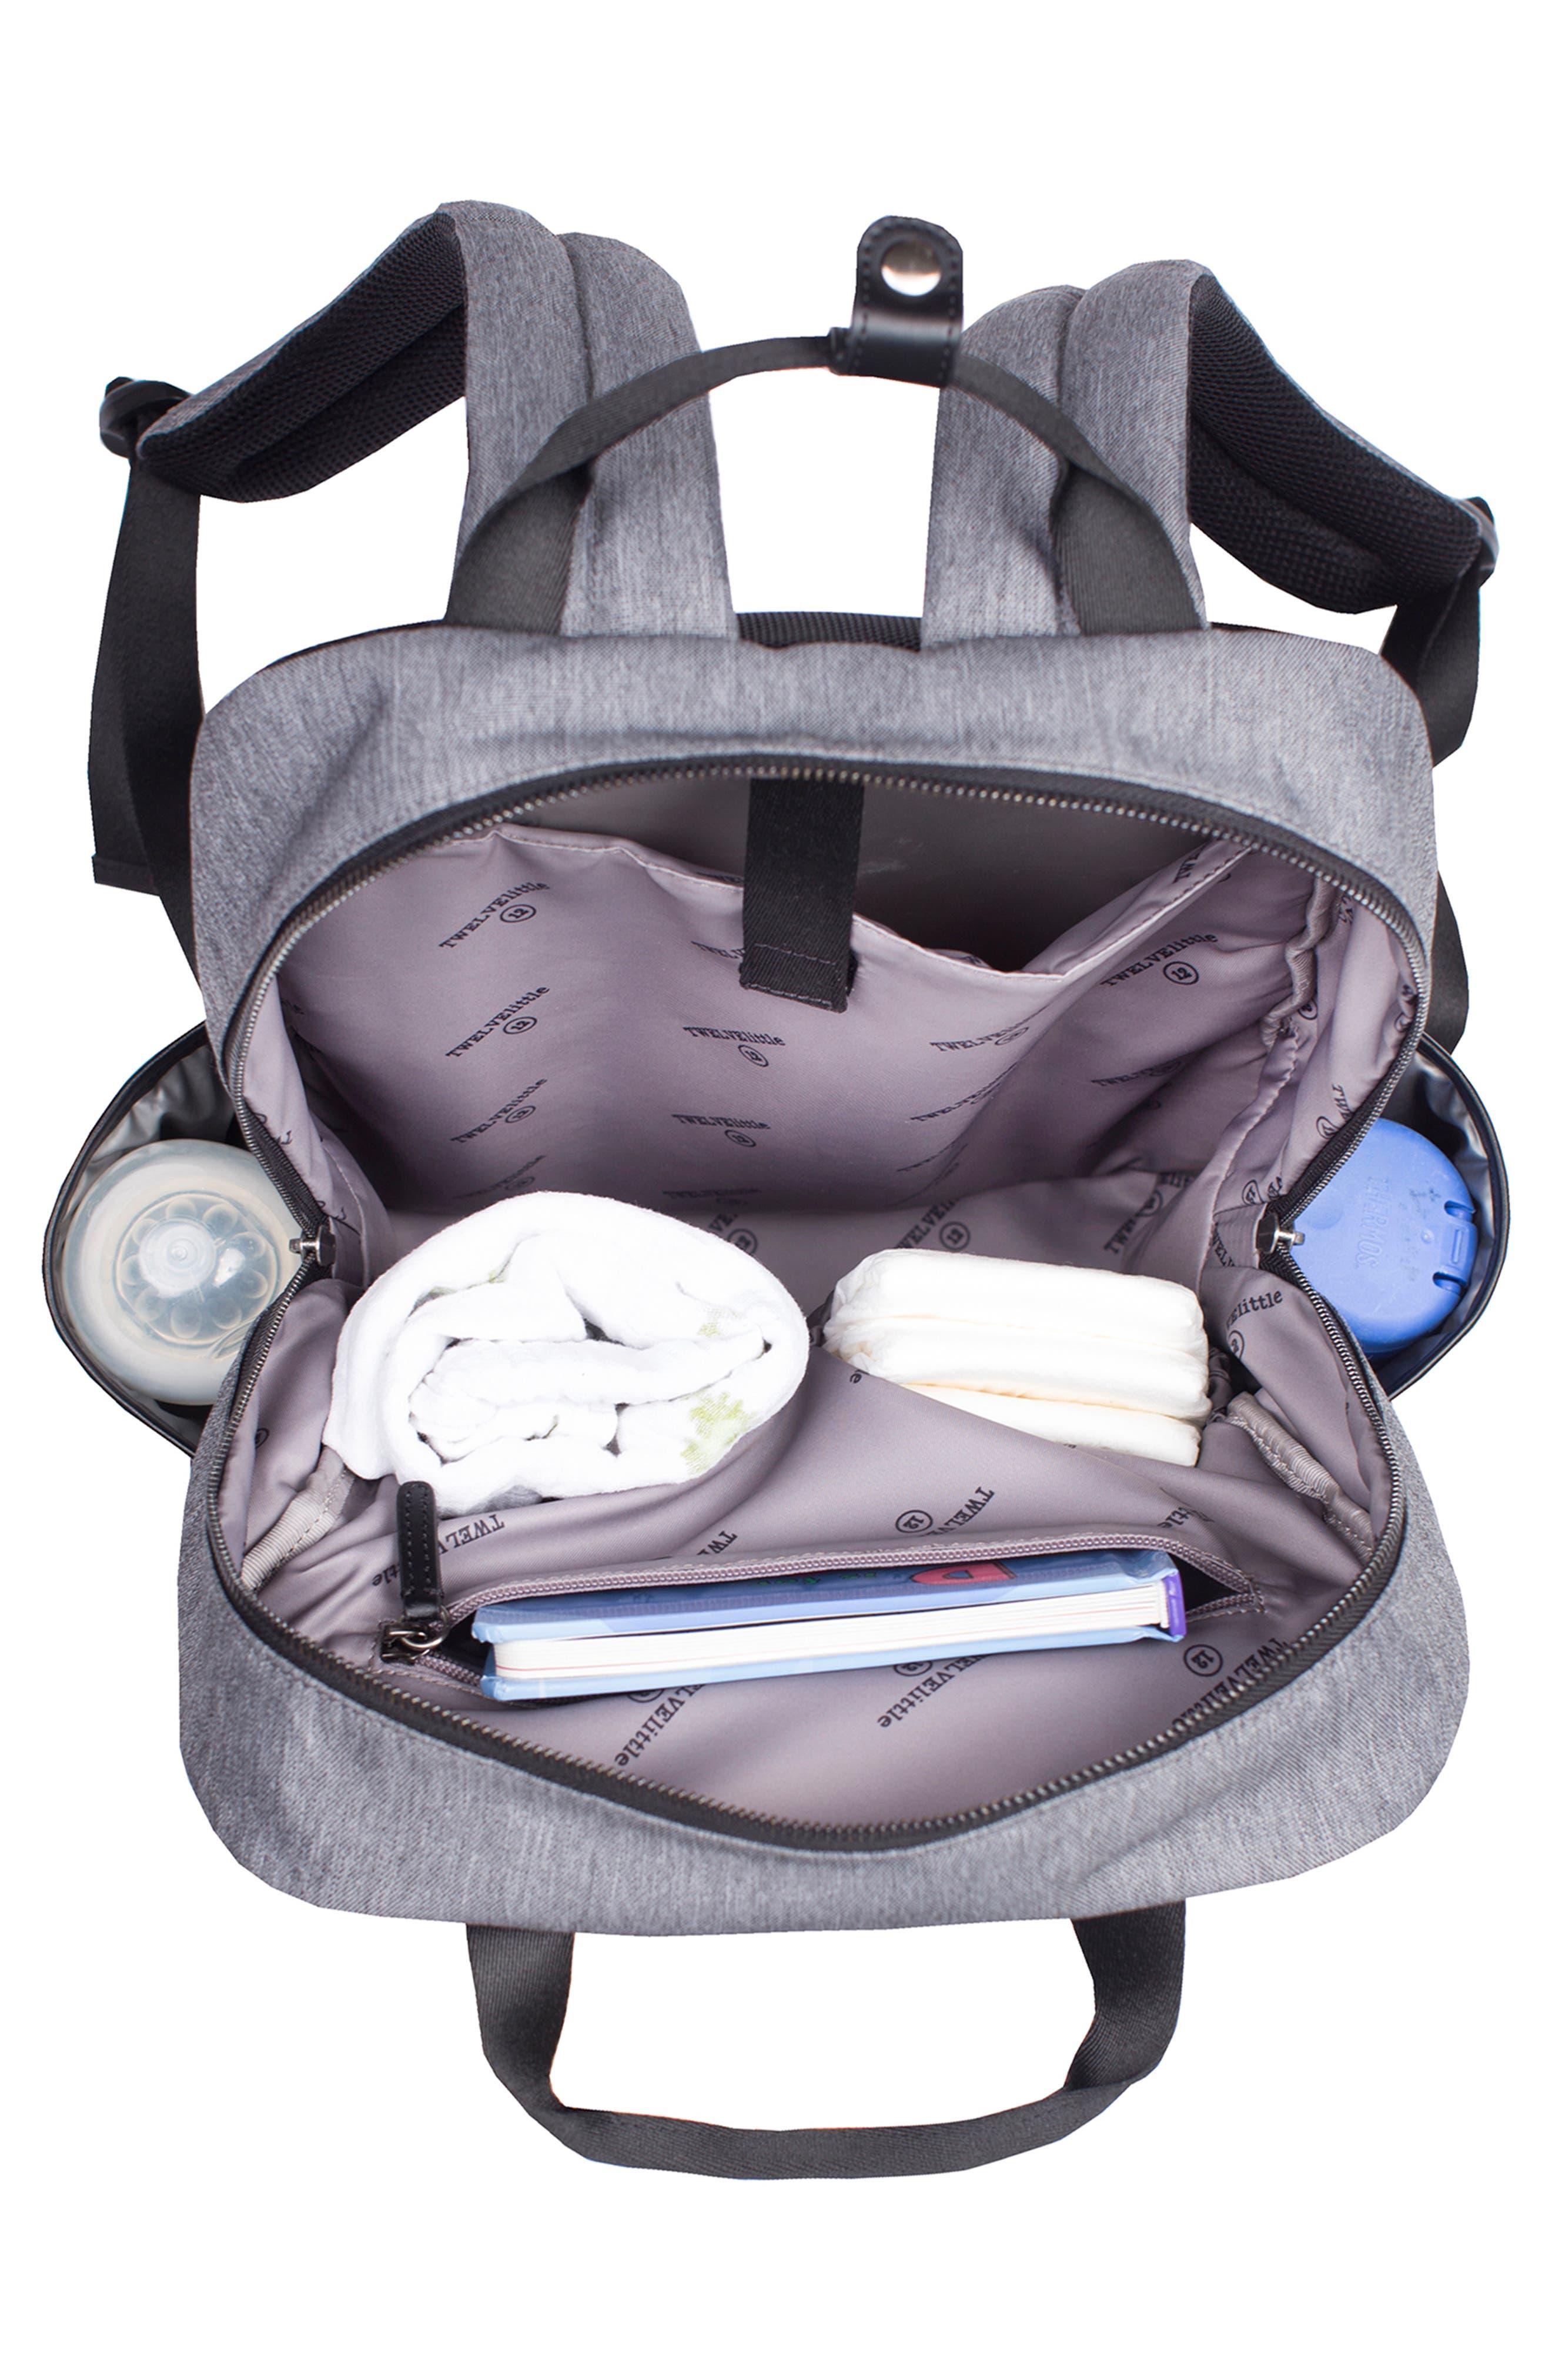 'Courage' Unisex Backpack Diaper Bag,                             Alternate thumbnail 2, color,                             020